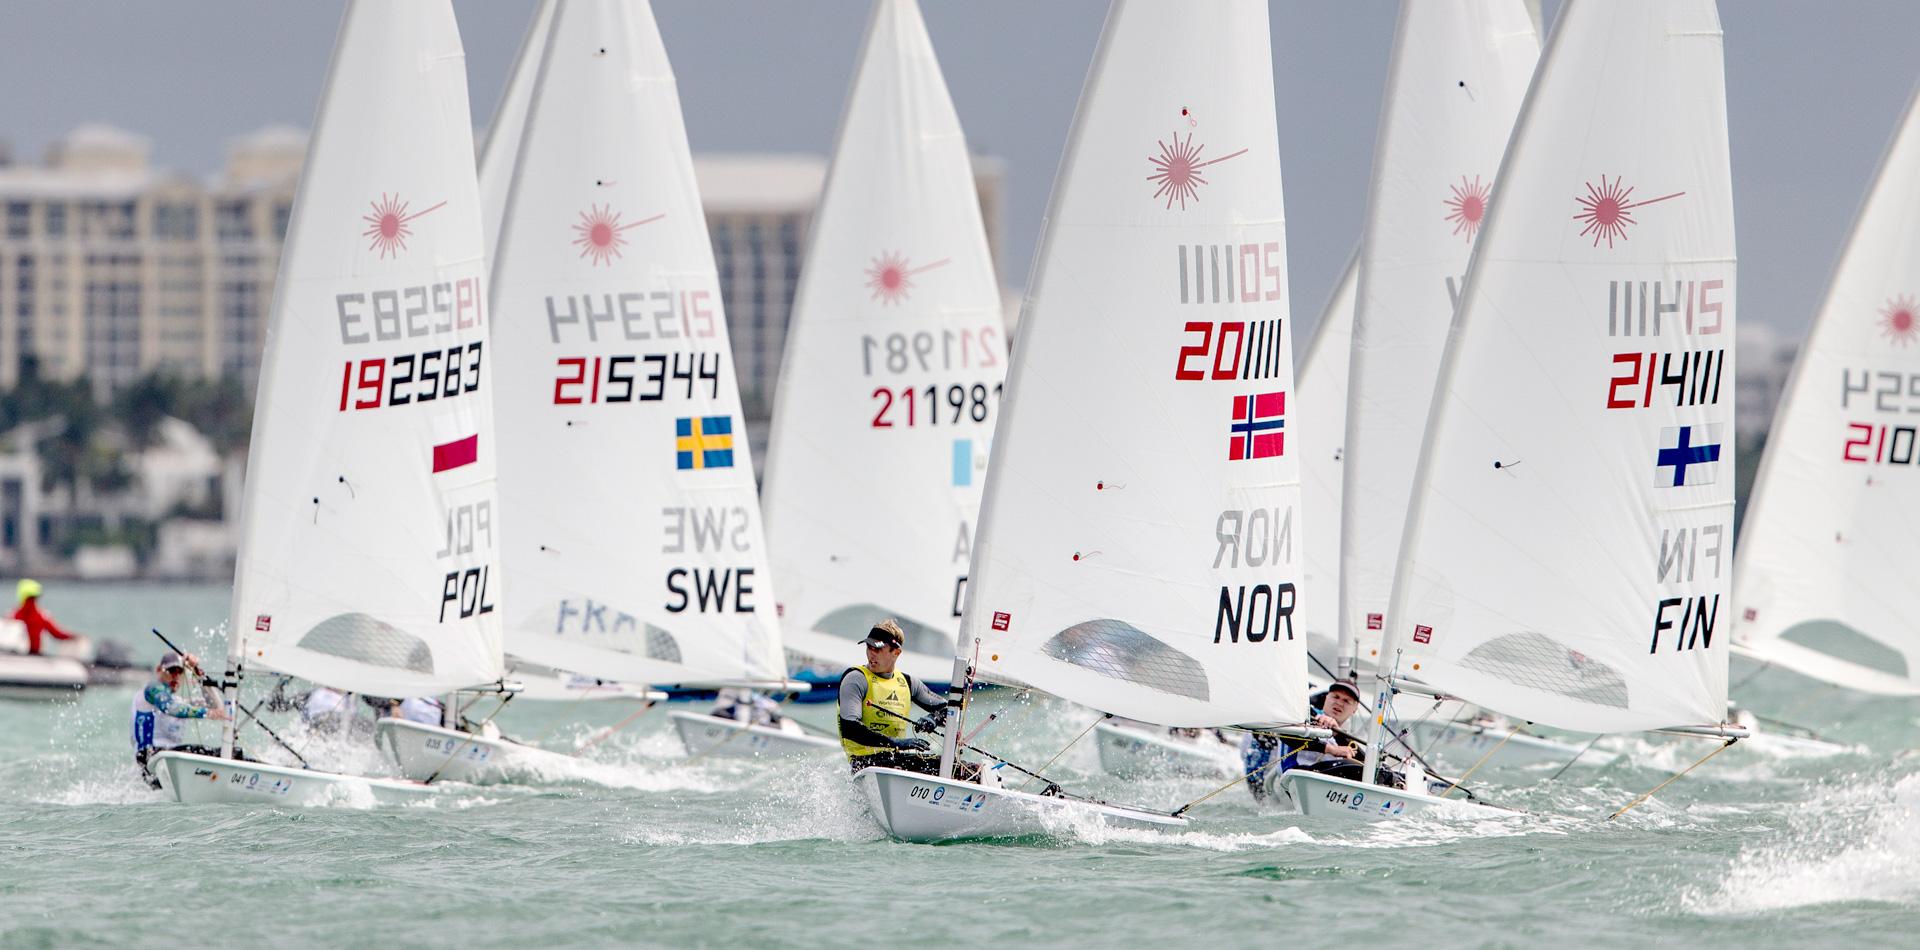 European Laser sailors